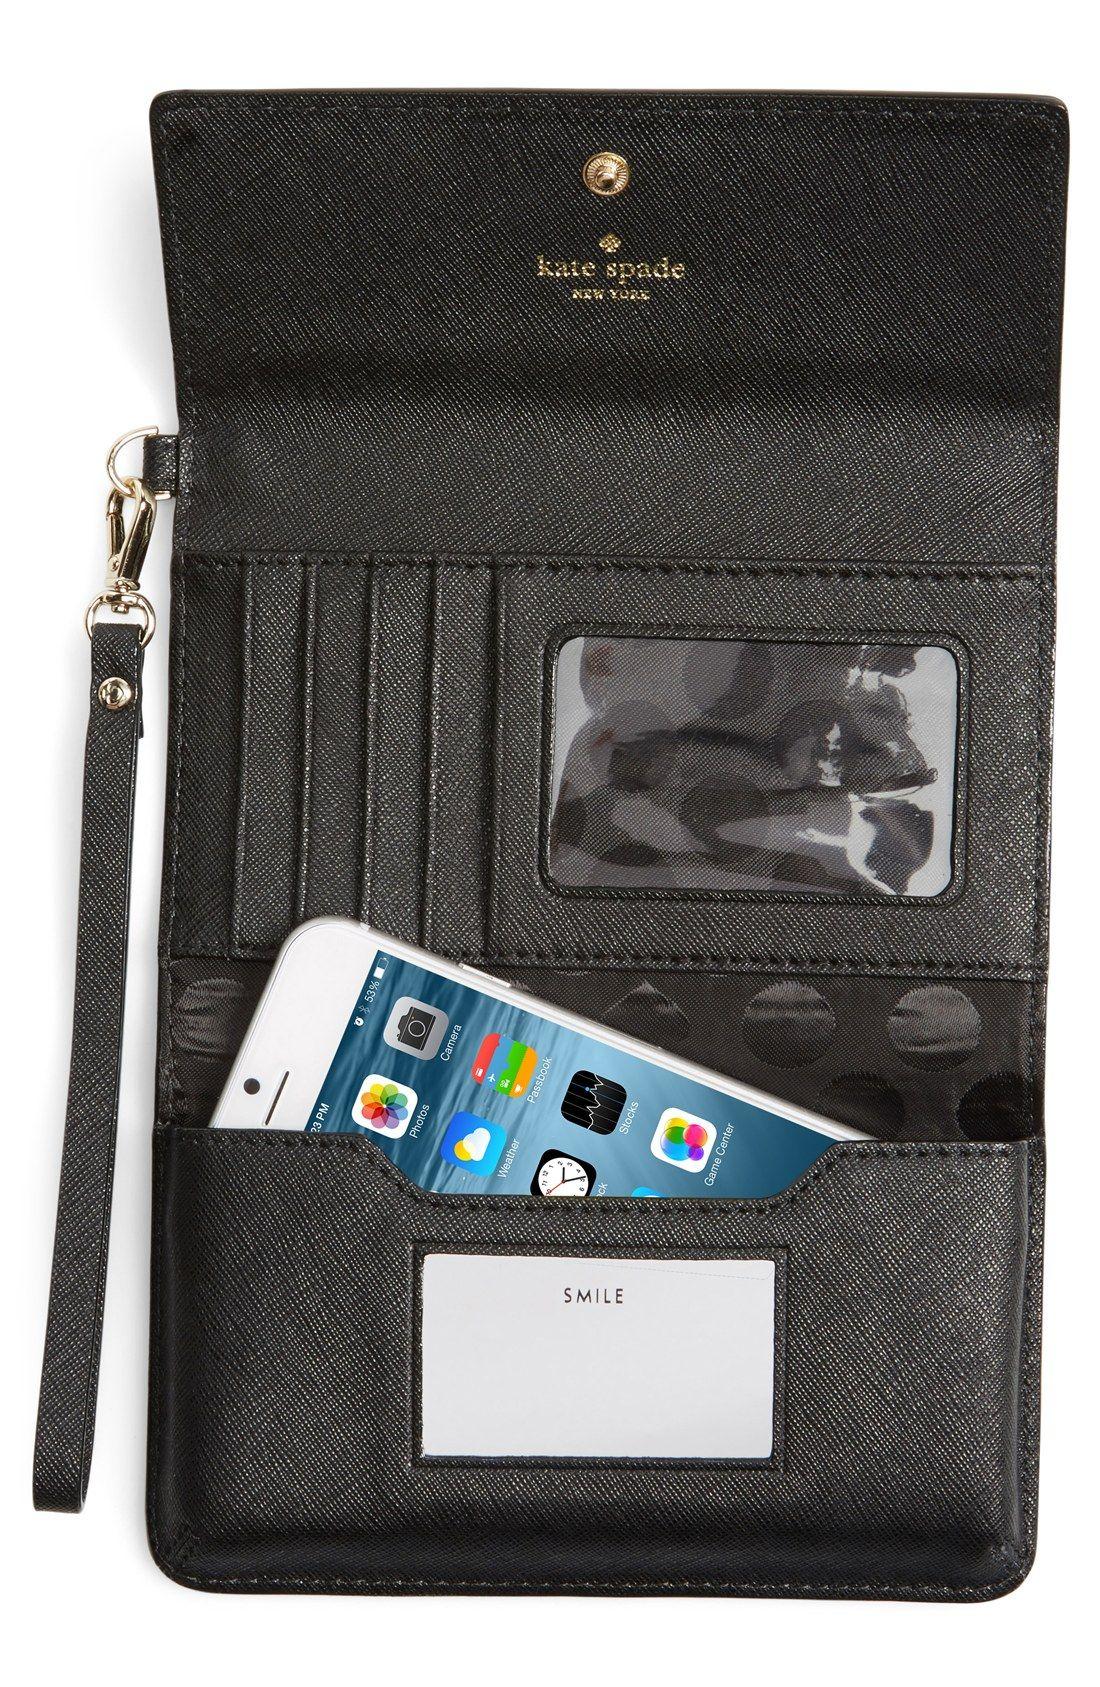 1451e43486c5 Purse and phone holder! kate spade new york  cedar street  iPhone 6 leather  wristlet